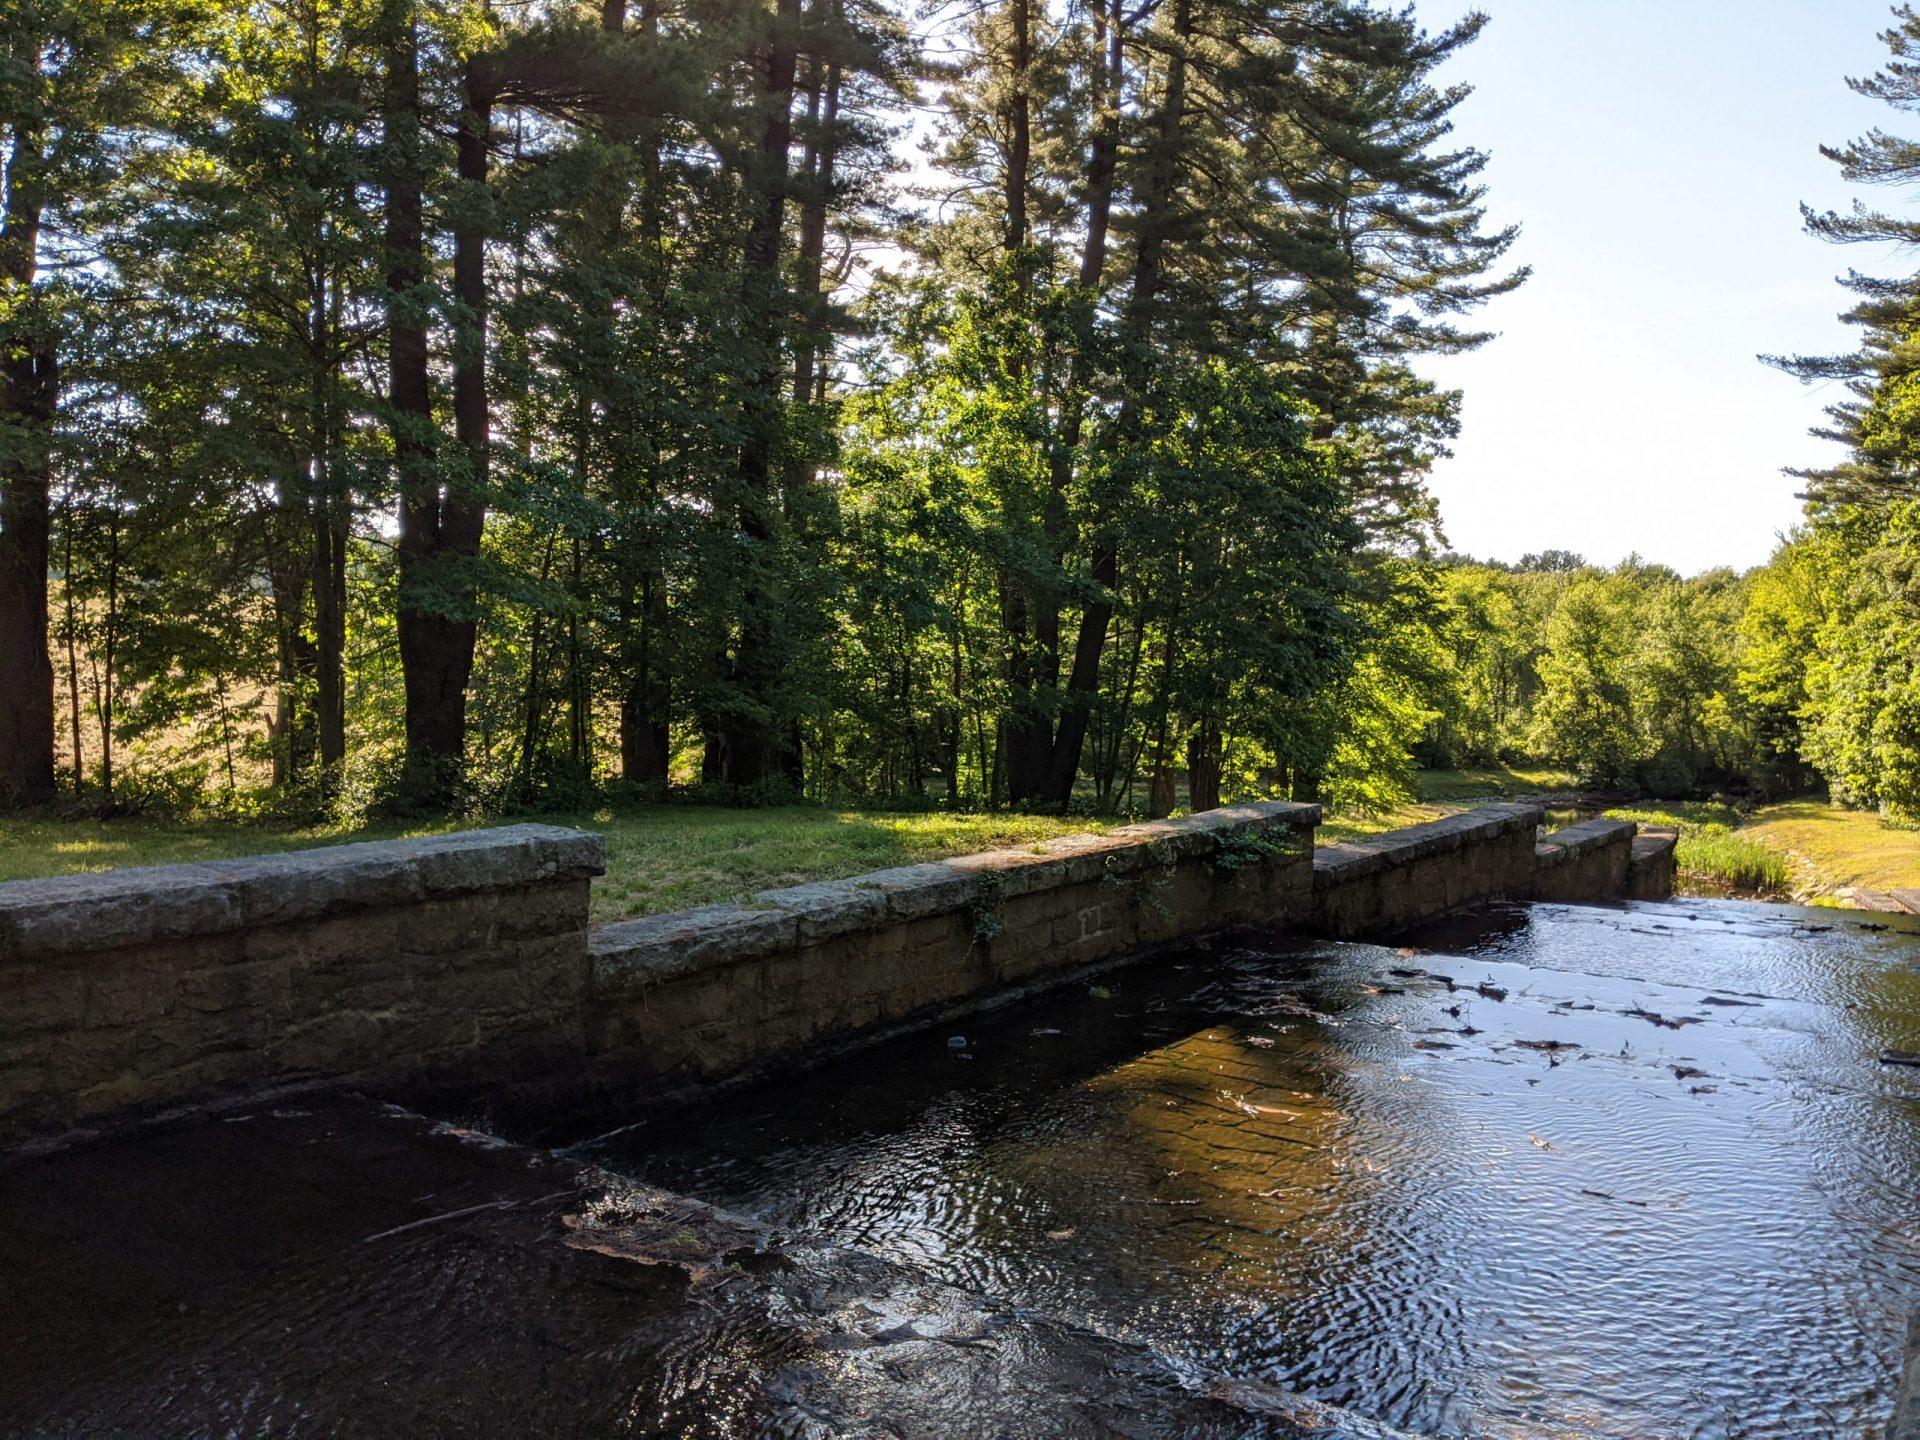 Ashland spillway - June 2020